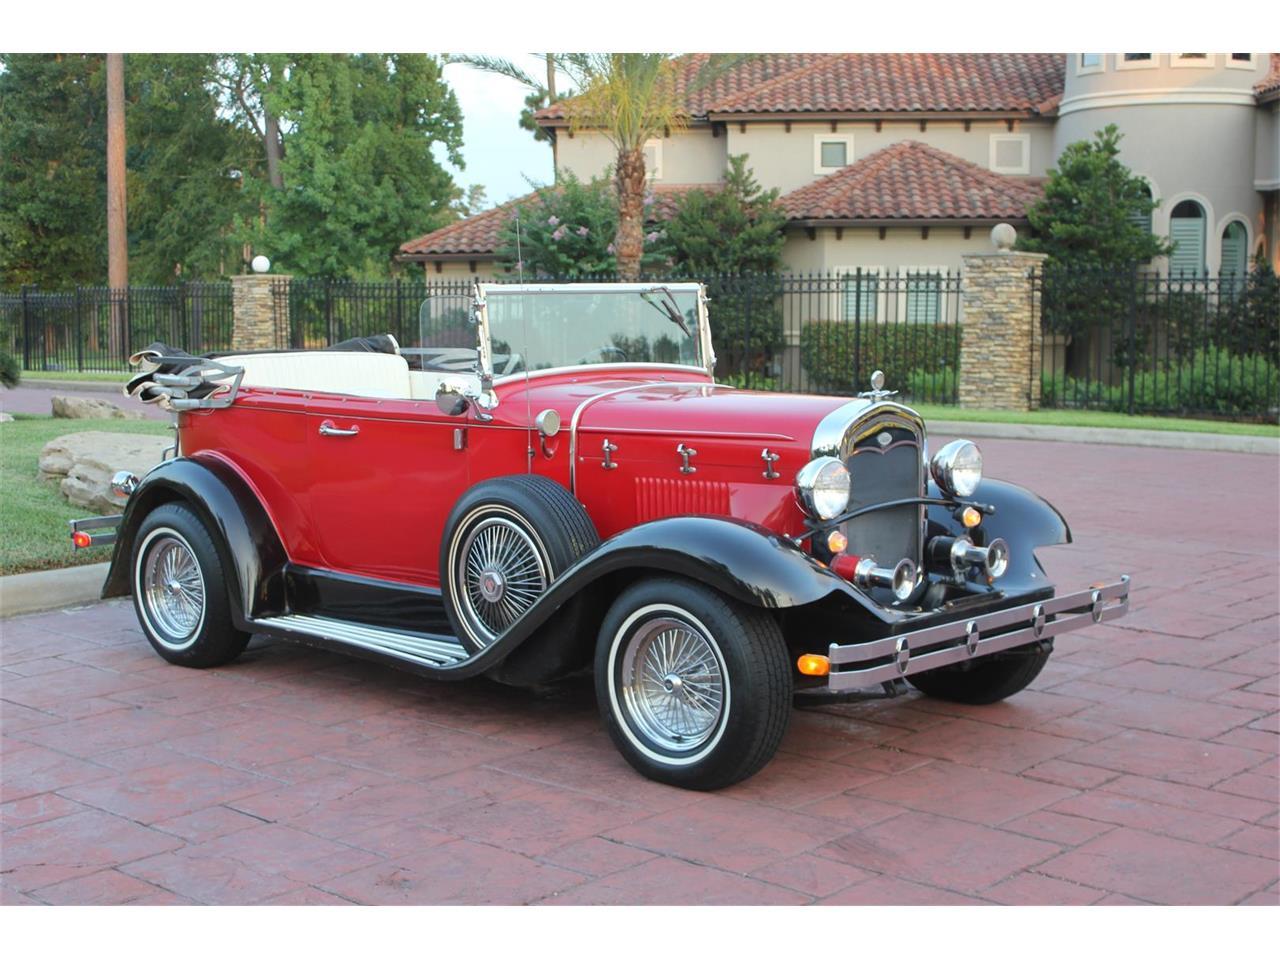 8514702-1973-glassic-roadster-1931-model-a-ford-replica-std.jpg